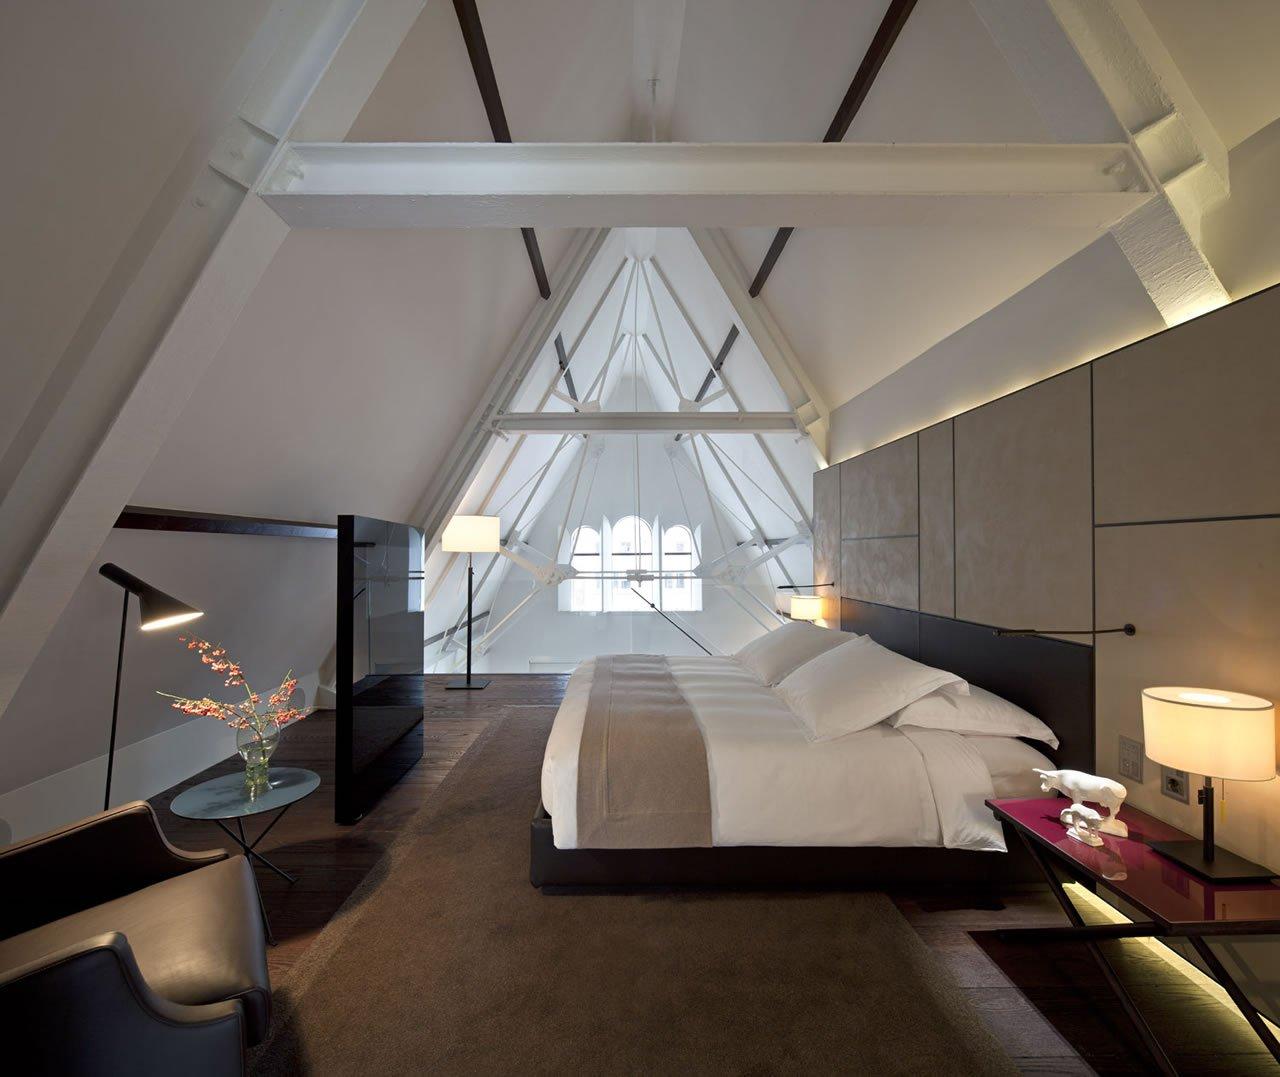 Van Gogh experience at Conservatorium Hotel Amsterdam (2)